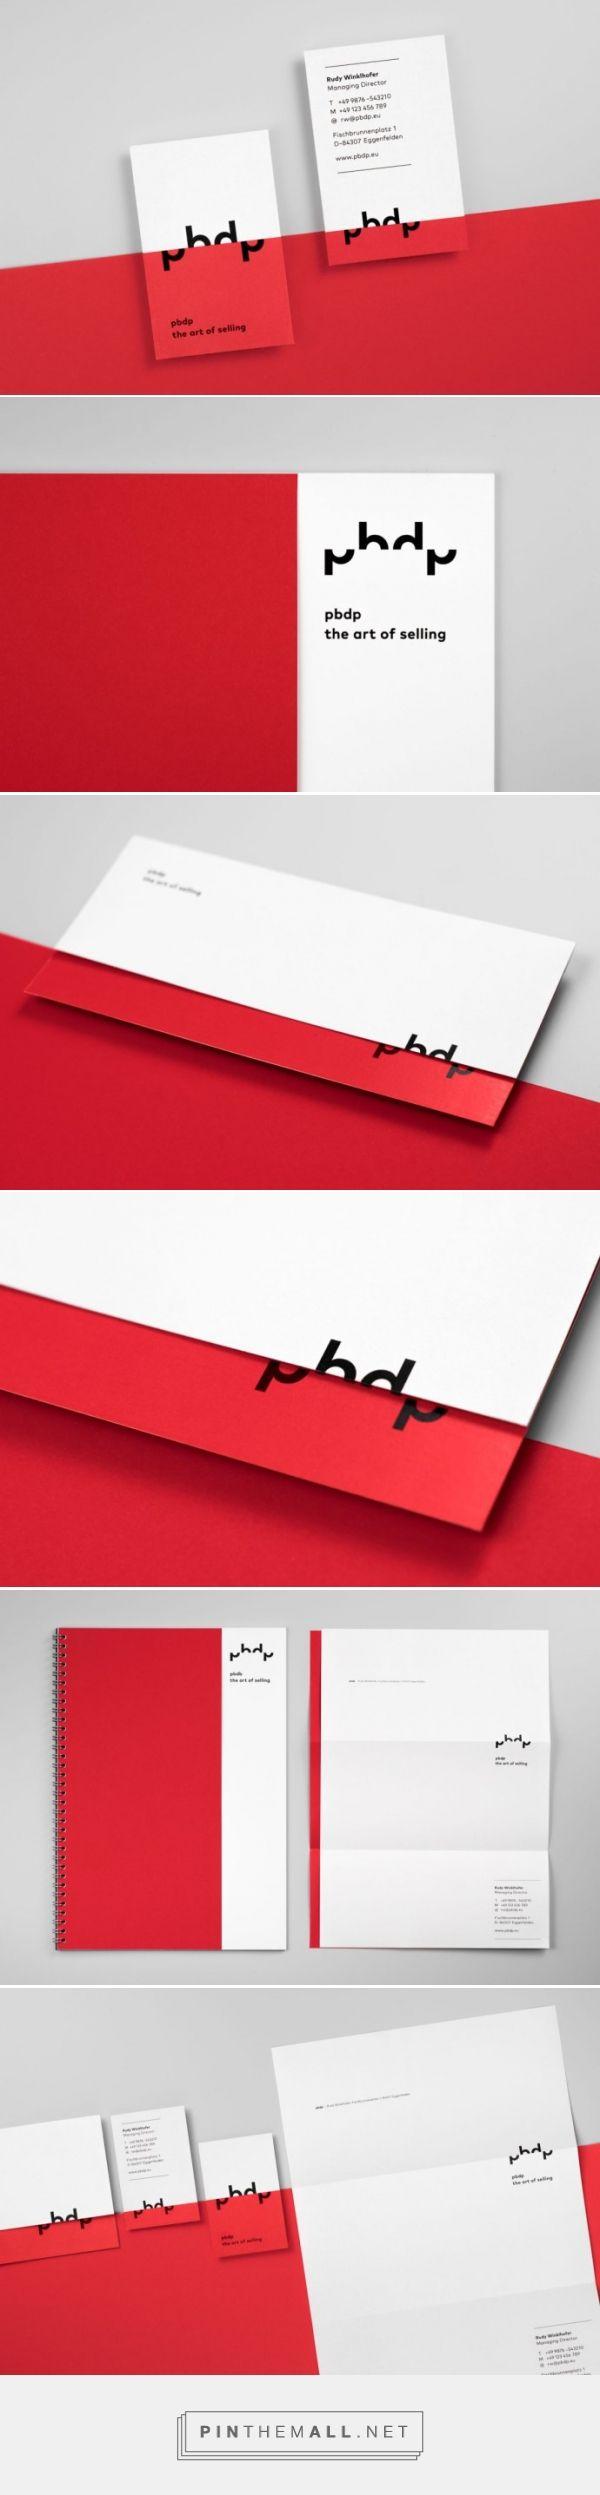 PBDP branding